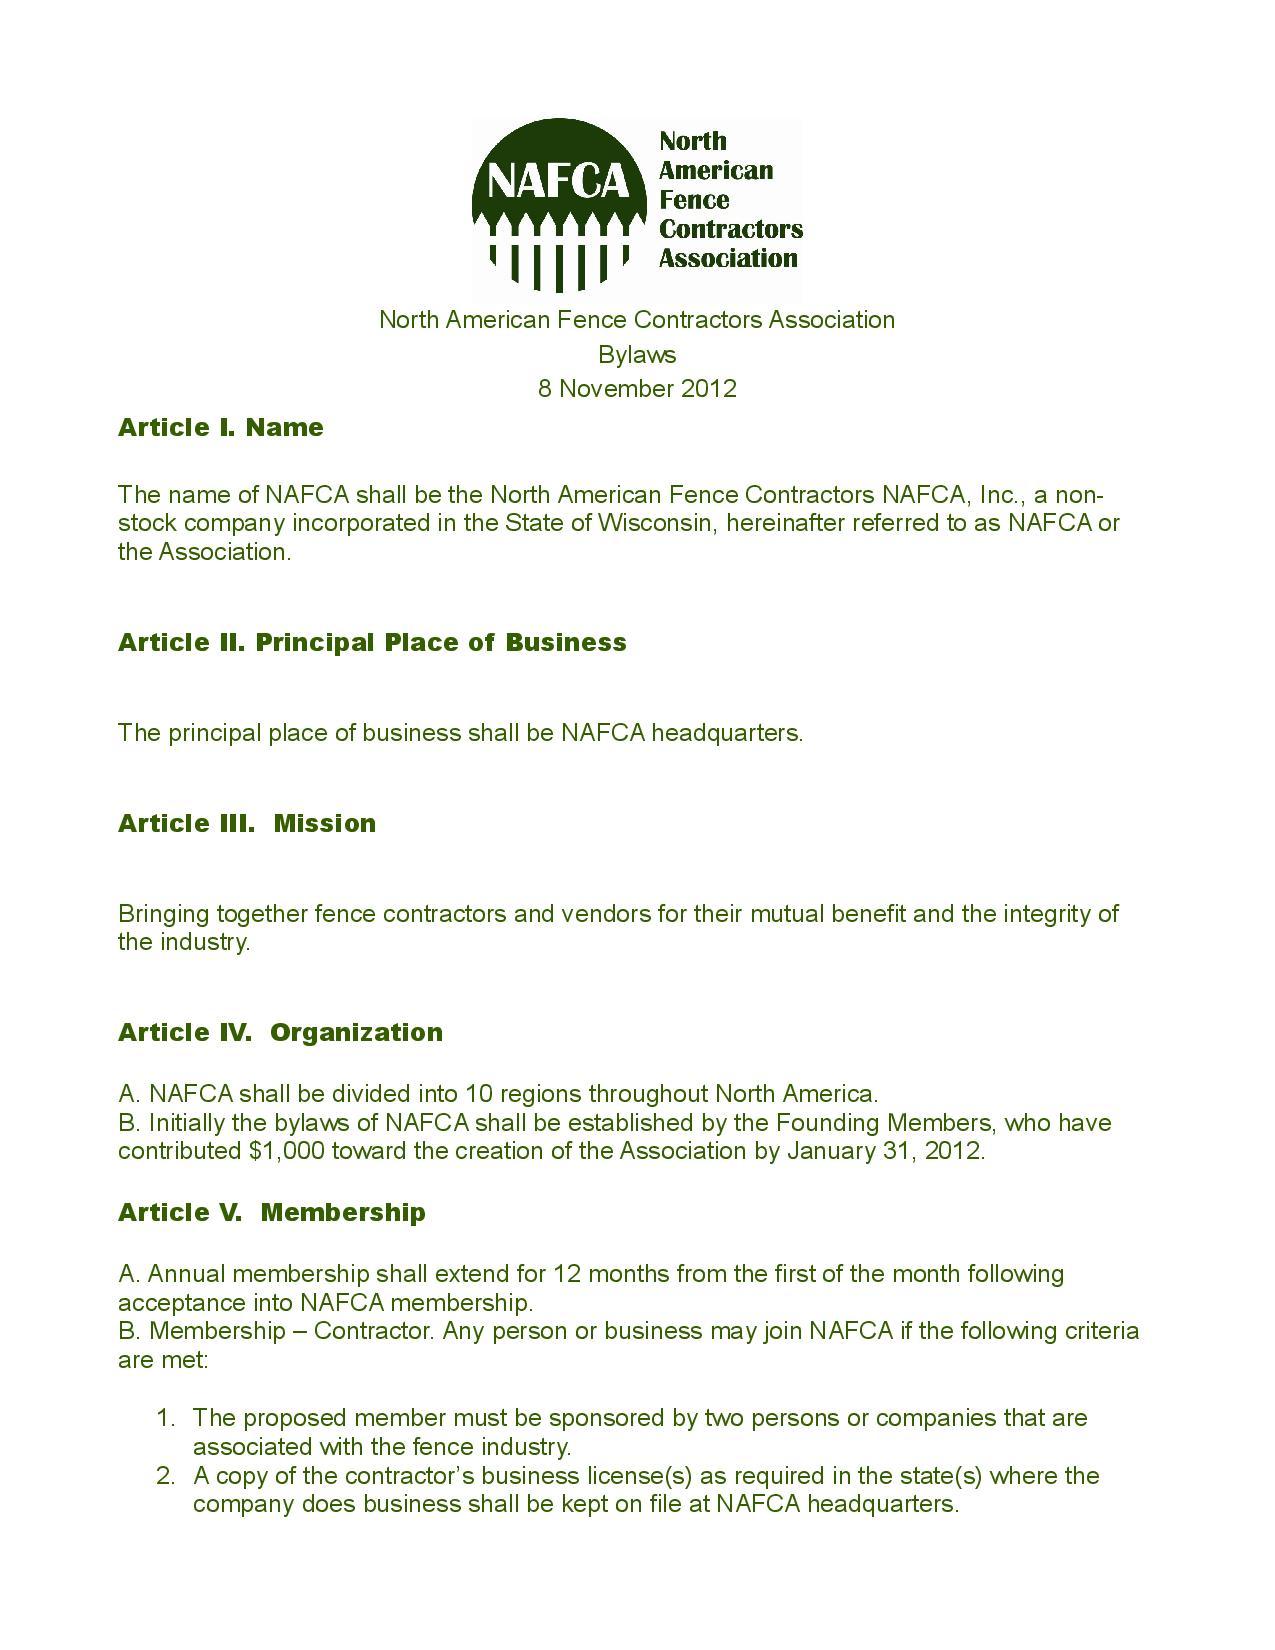 NAFCA Bylaws 8 11 2012-page-001